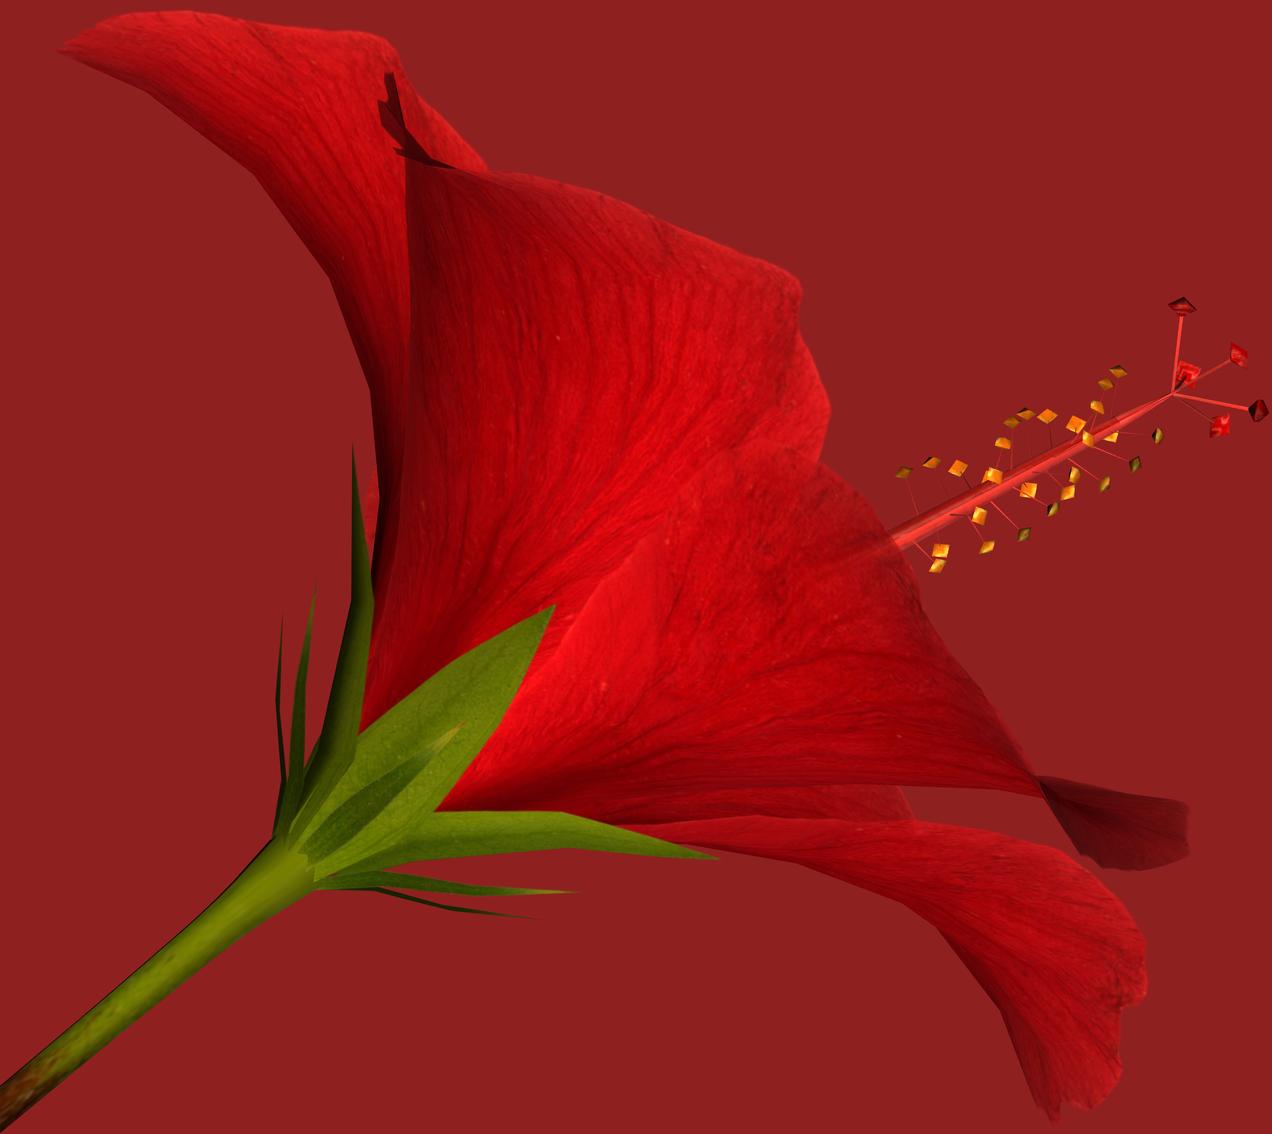 Tropics clipart hibiscus flower #14